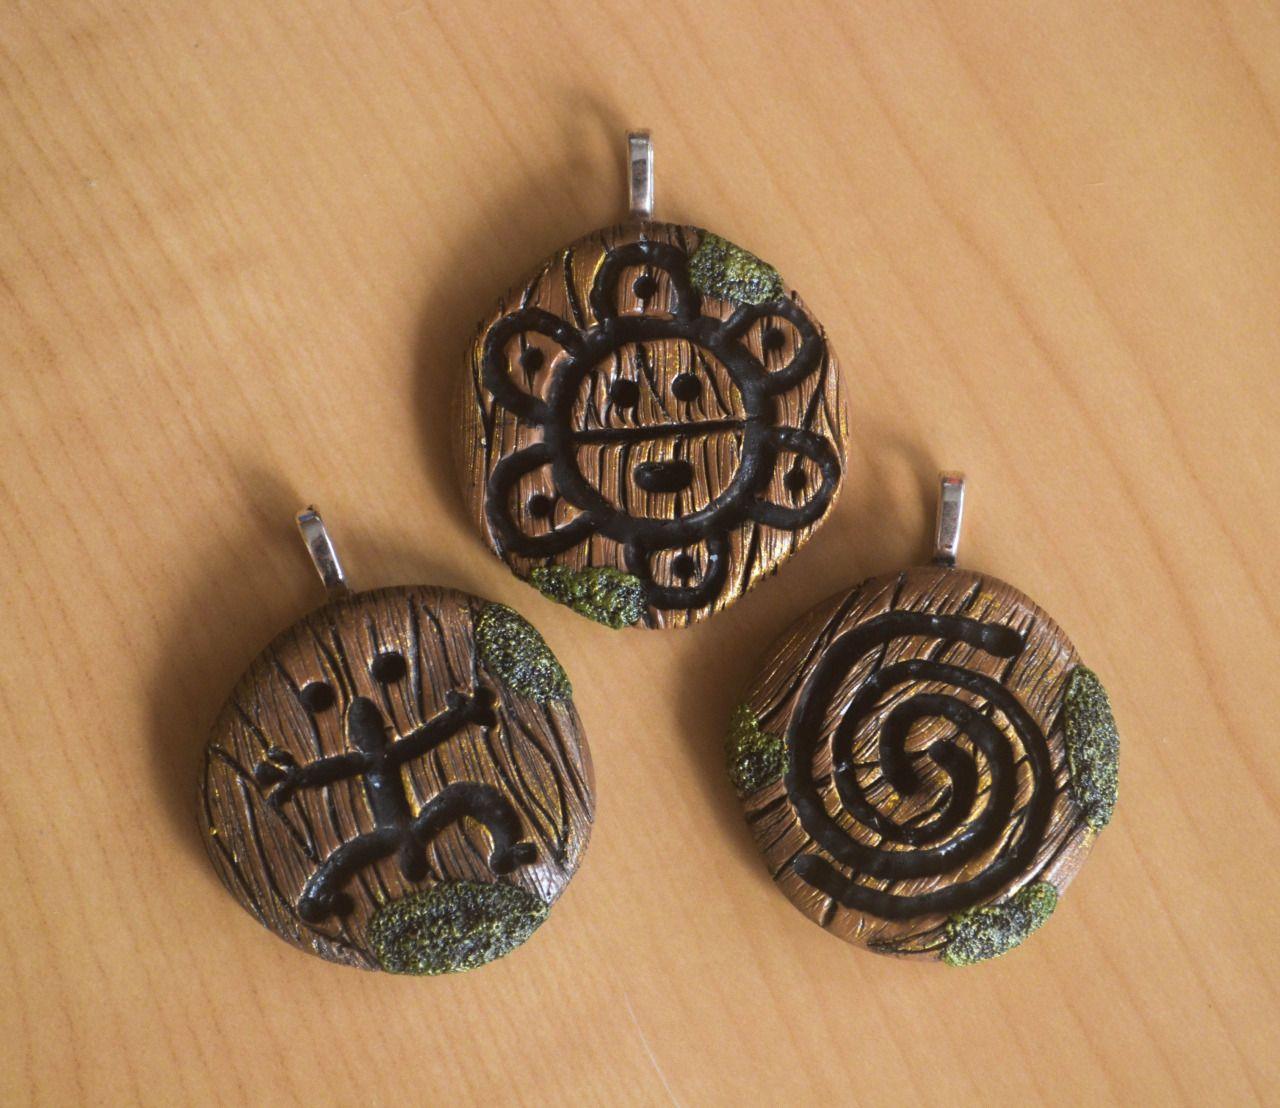 Taino symbols adding them to the sleeve boricua tattoos taino symbols adding them to the sleeve boricua buycottarizona